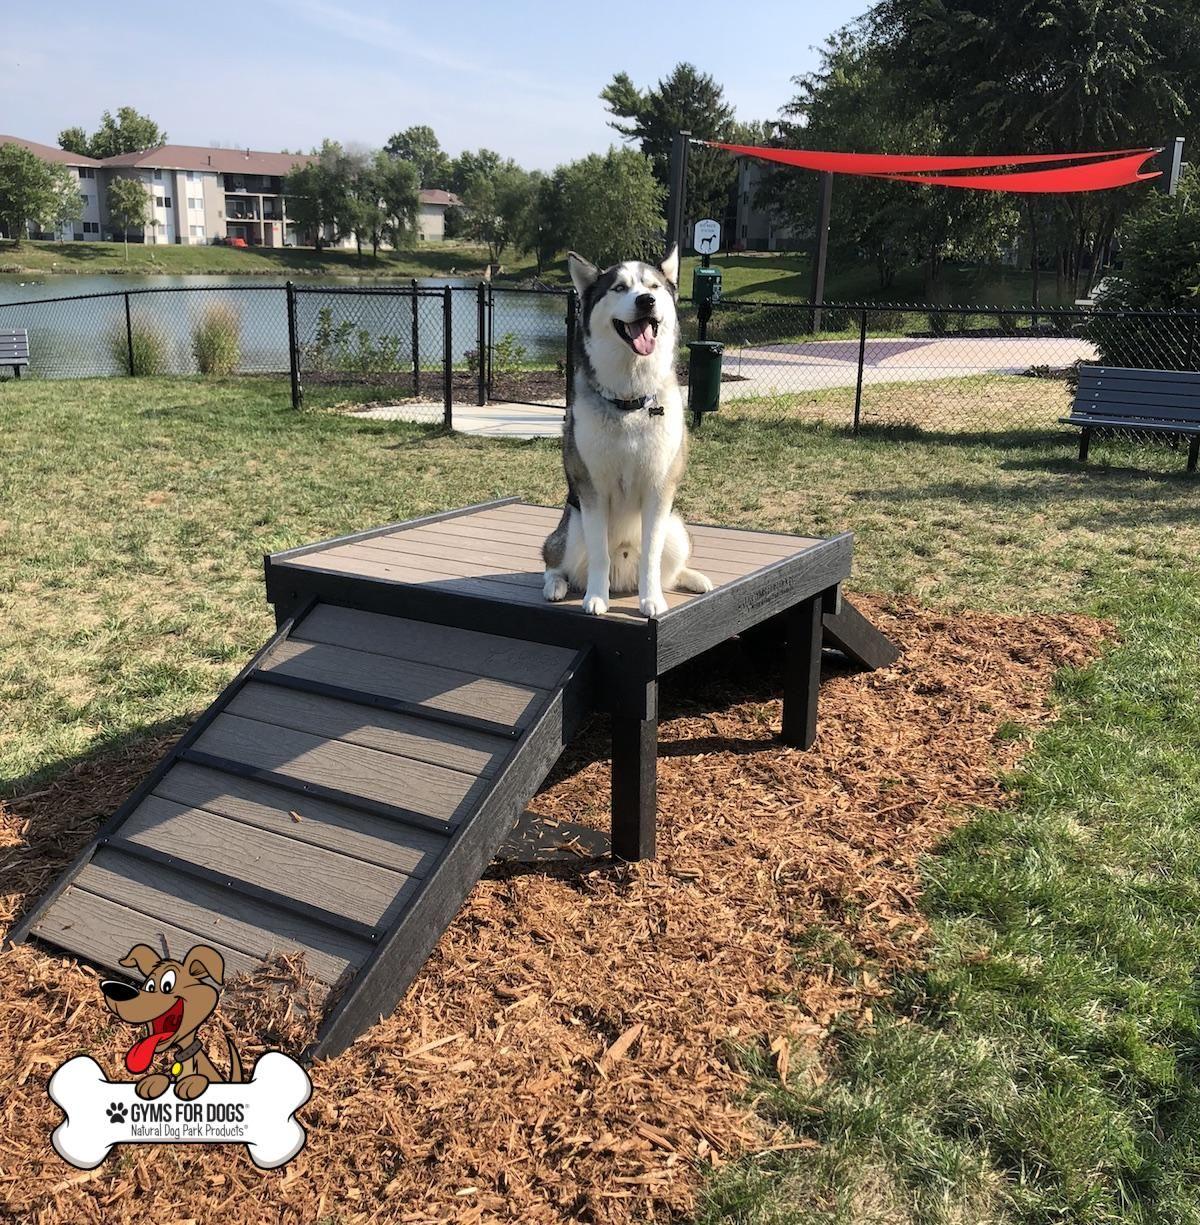 Dog Daycare Play Equipment in 2020 | Dog playground, Dog ...